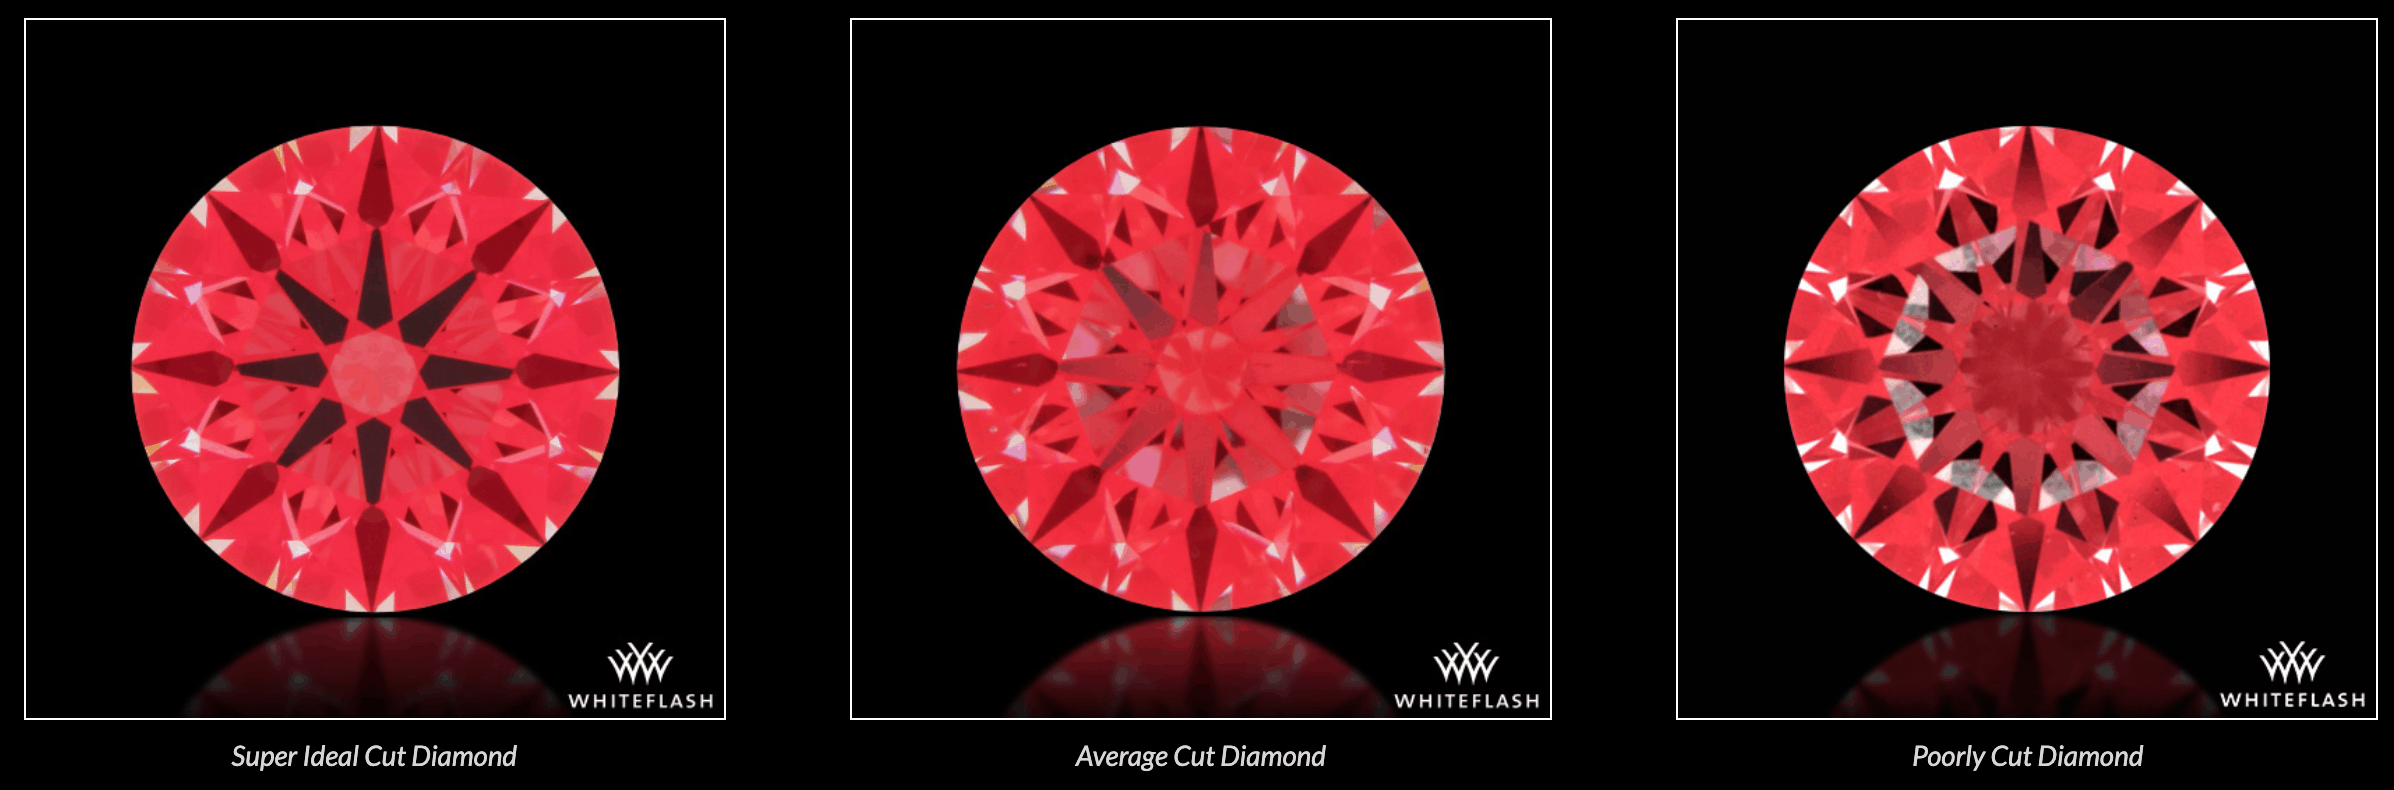 White Flash ideal cut diamonds